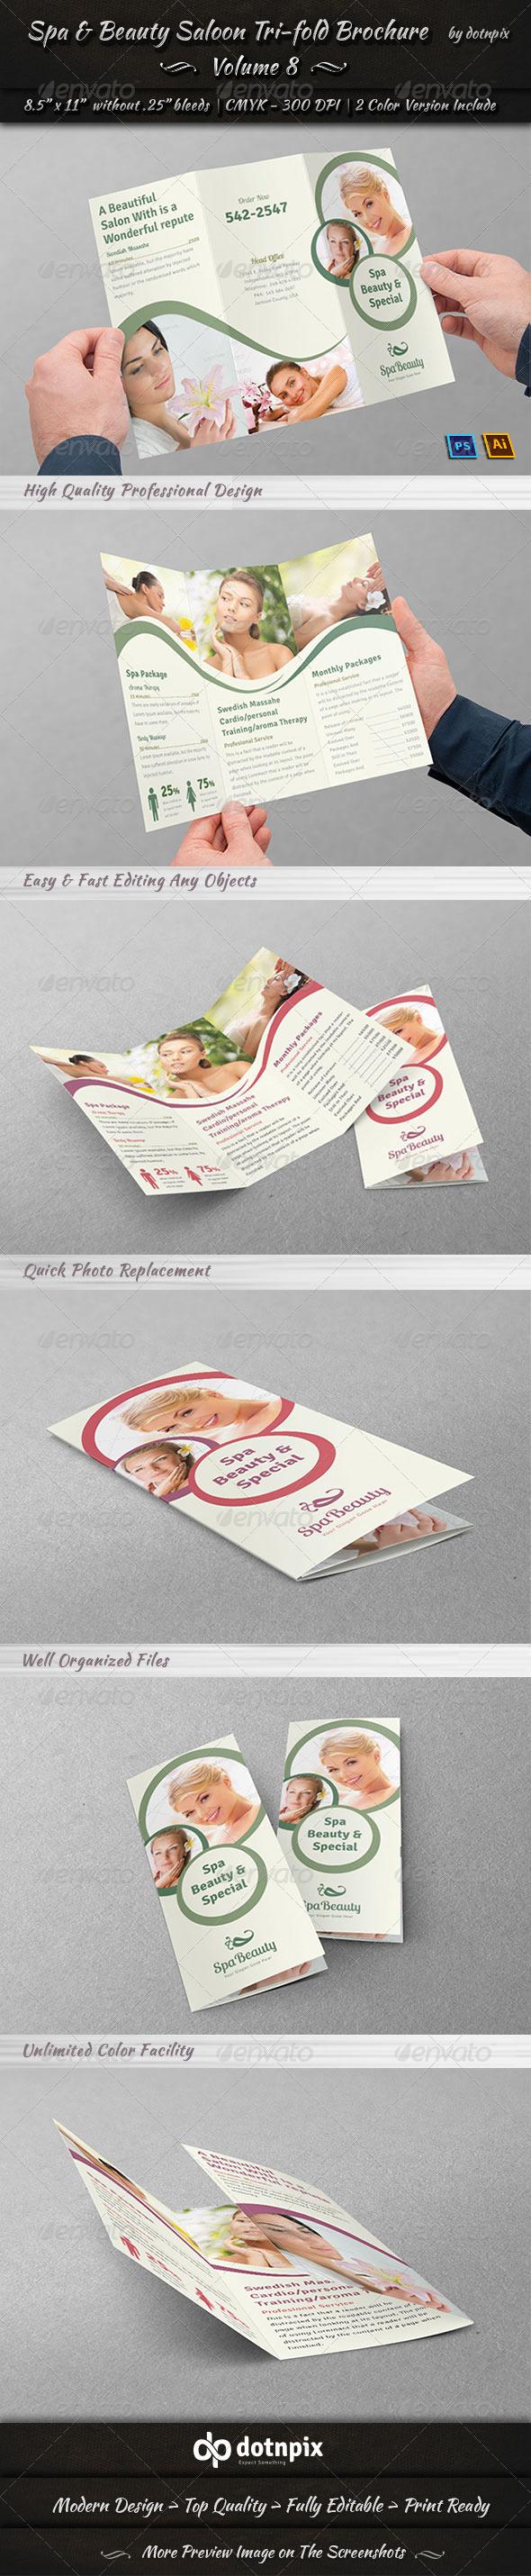 GraphicRiver Spa & Beauty Saloon Tri-fold Brochure Volume 8 7888058